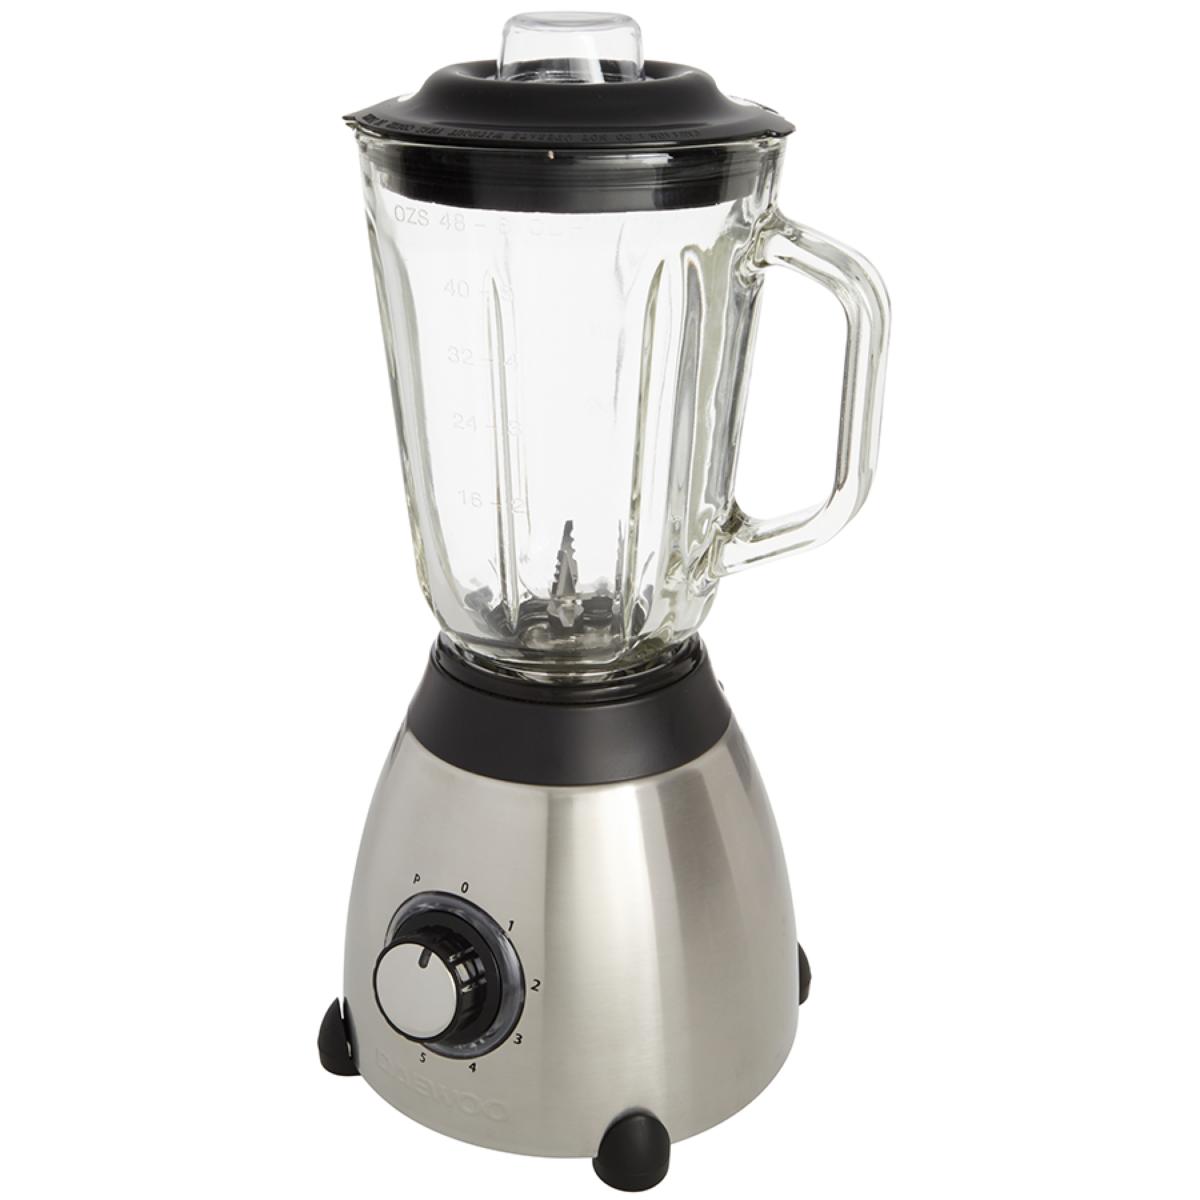 Daewoo 1.5L 5-Speed Glass Jug Kitchen Blender